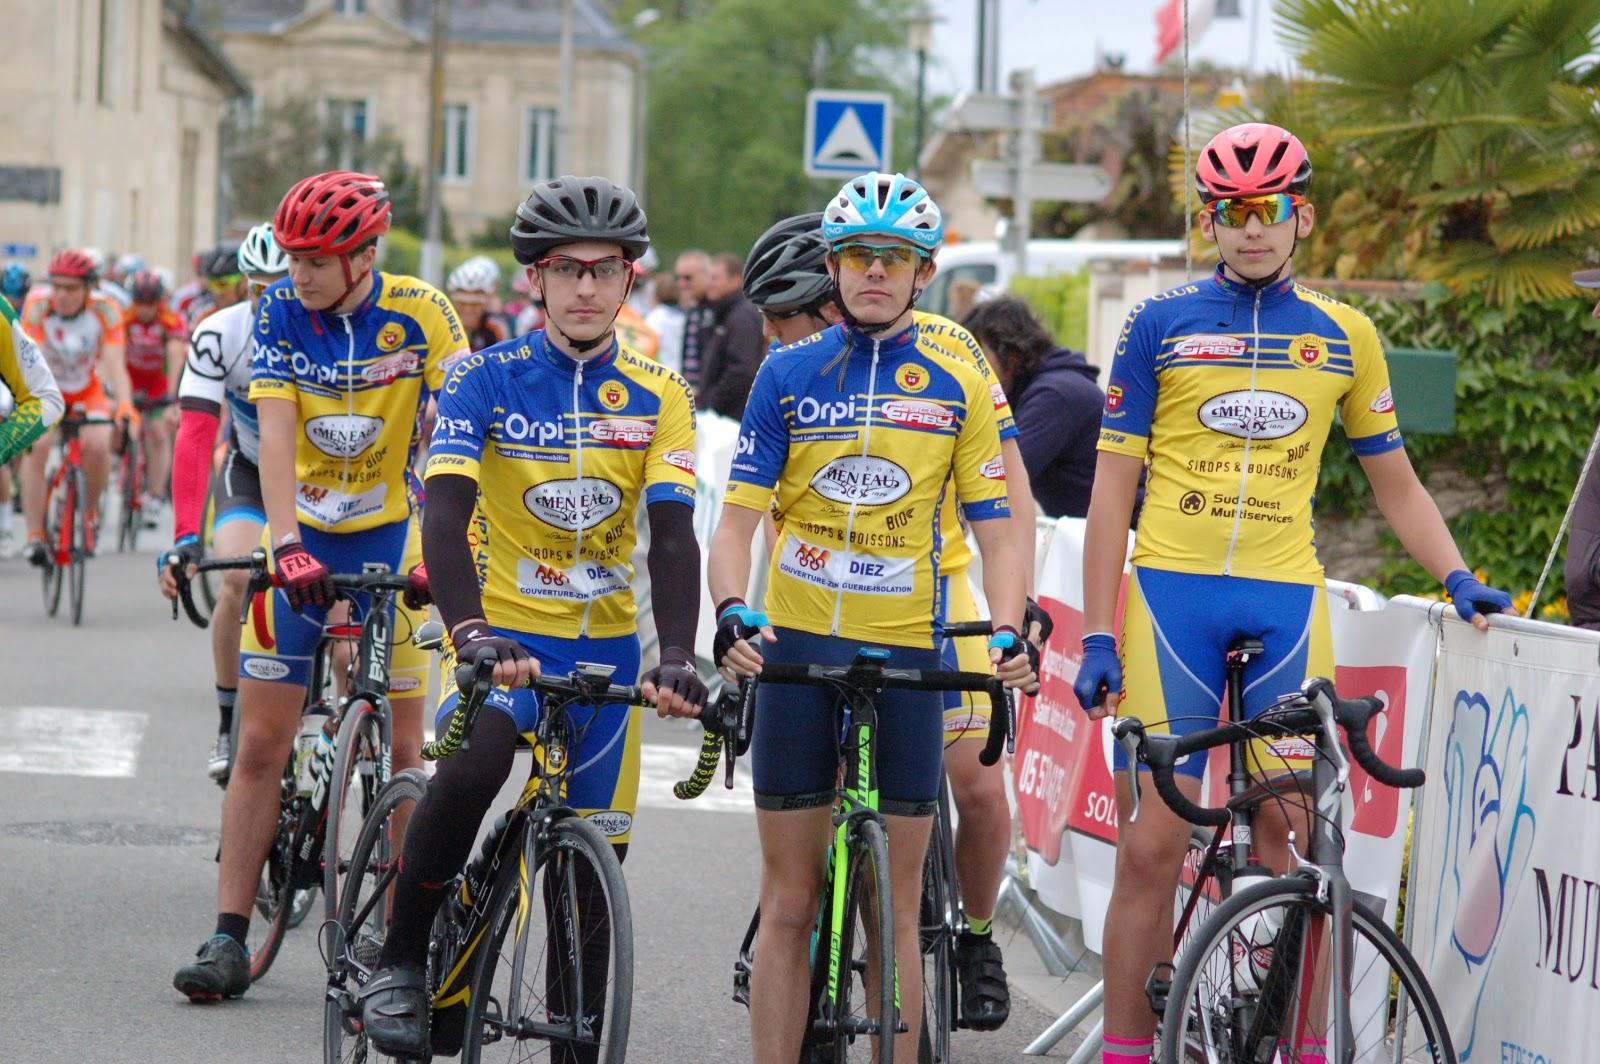 Calendrier Ufolep 2019 Cyclisme.Galerie Photo Cyclo Club St Loubes